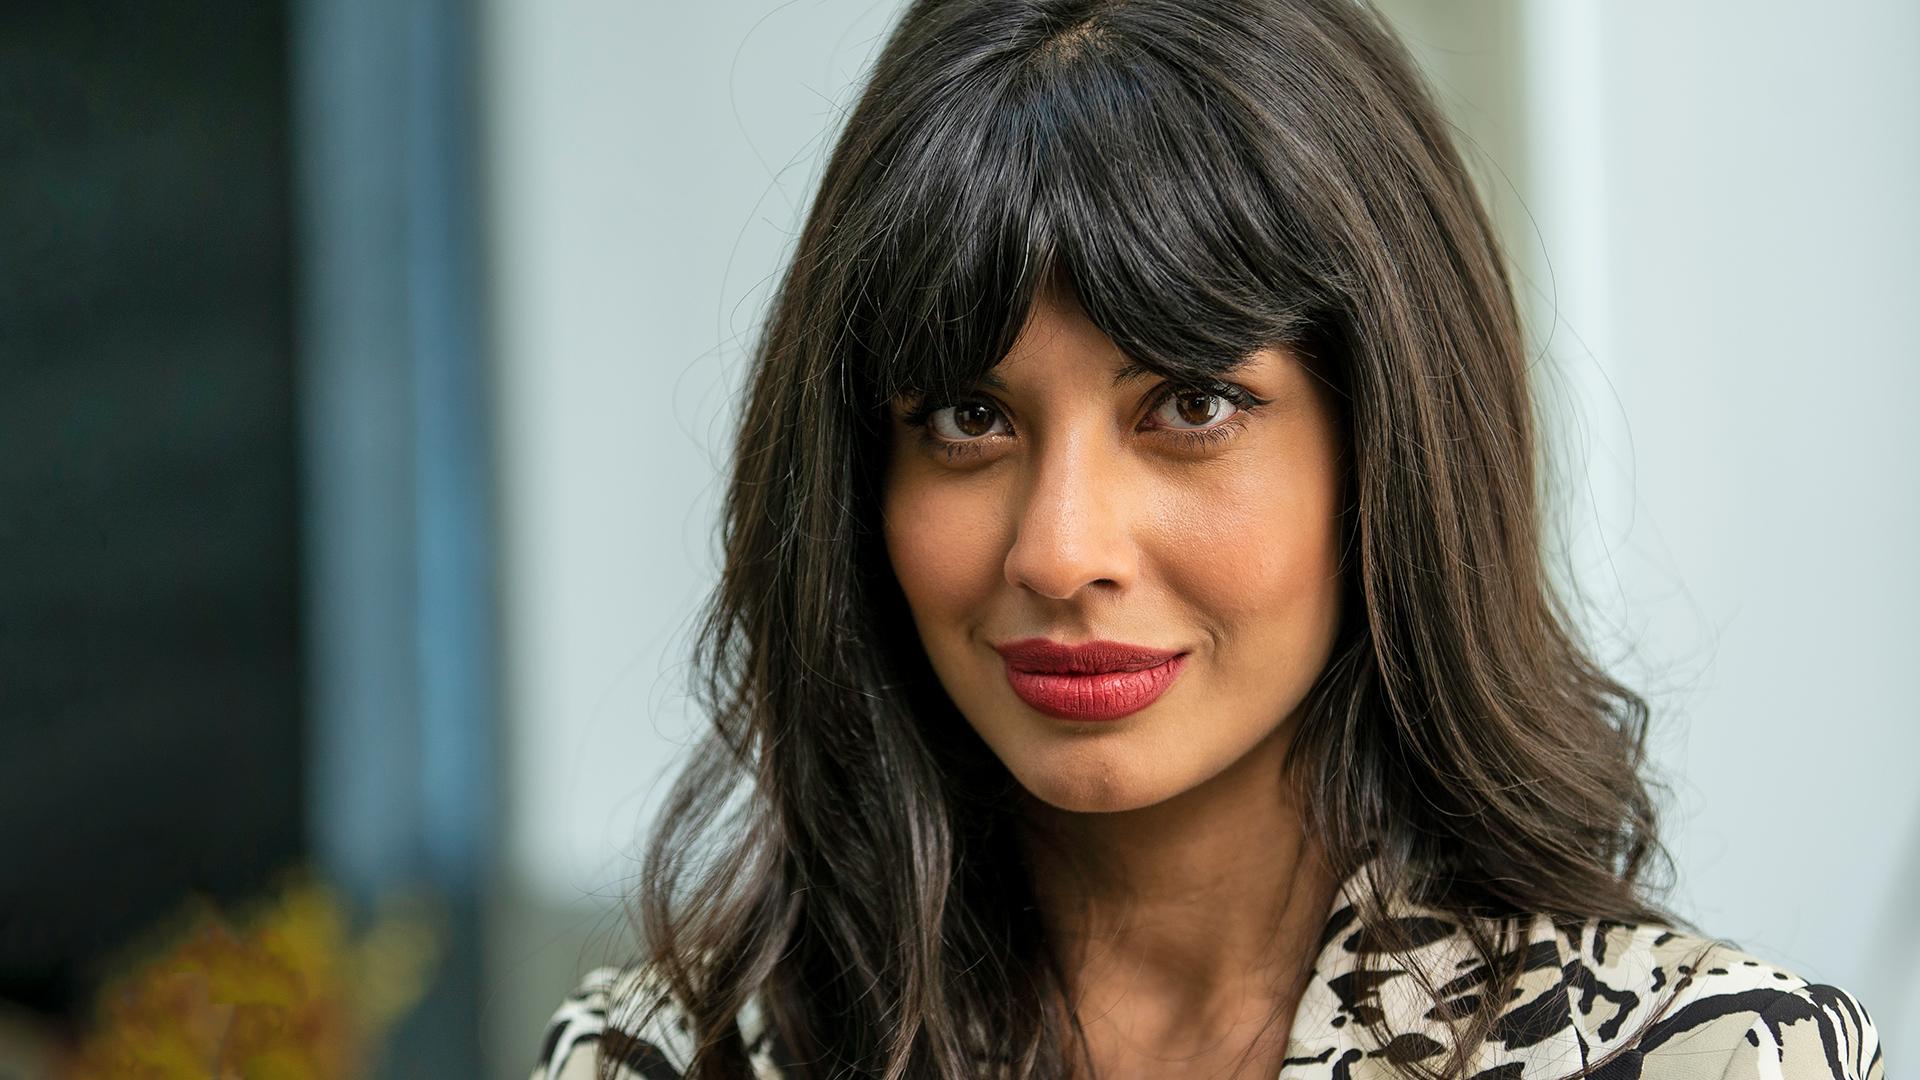 Jameela Jamil Begs Khloe Kardashian Not To 'Hurt Other Girls' With Flat Tummy Post